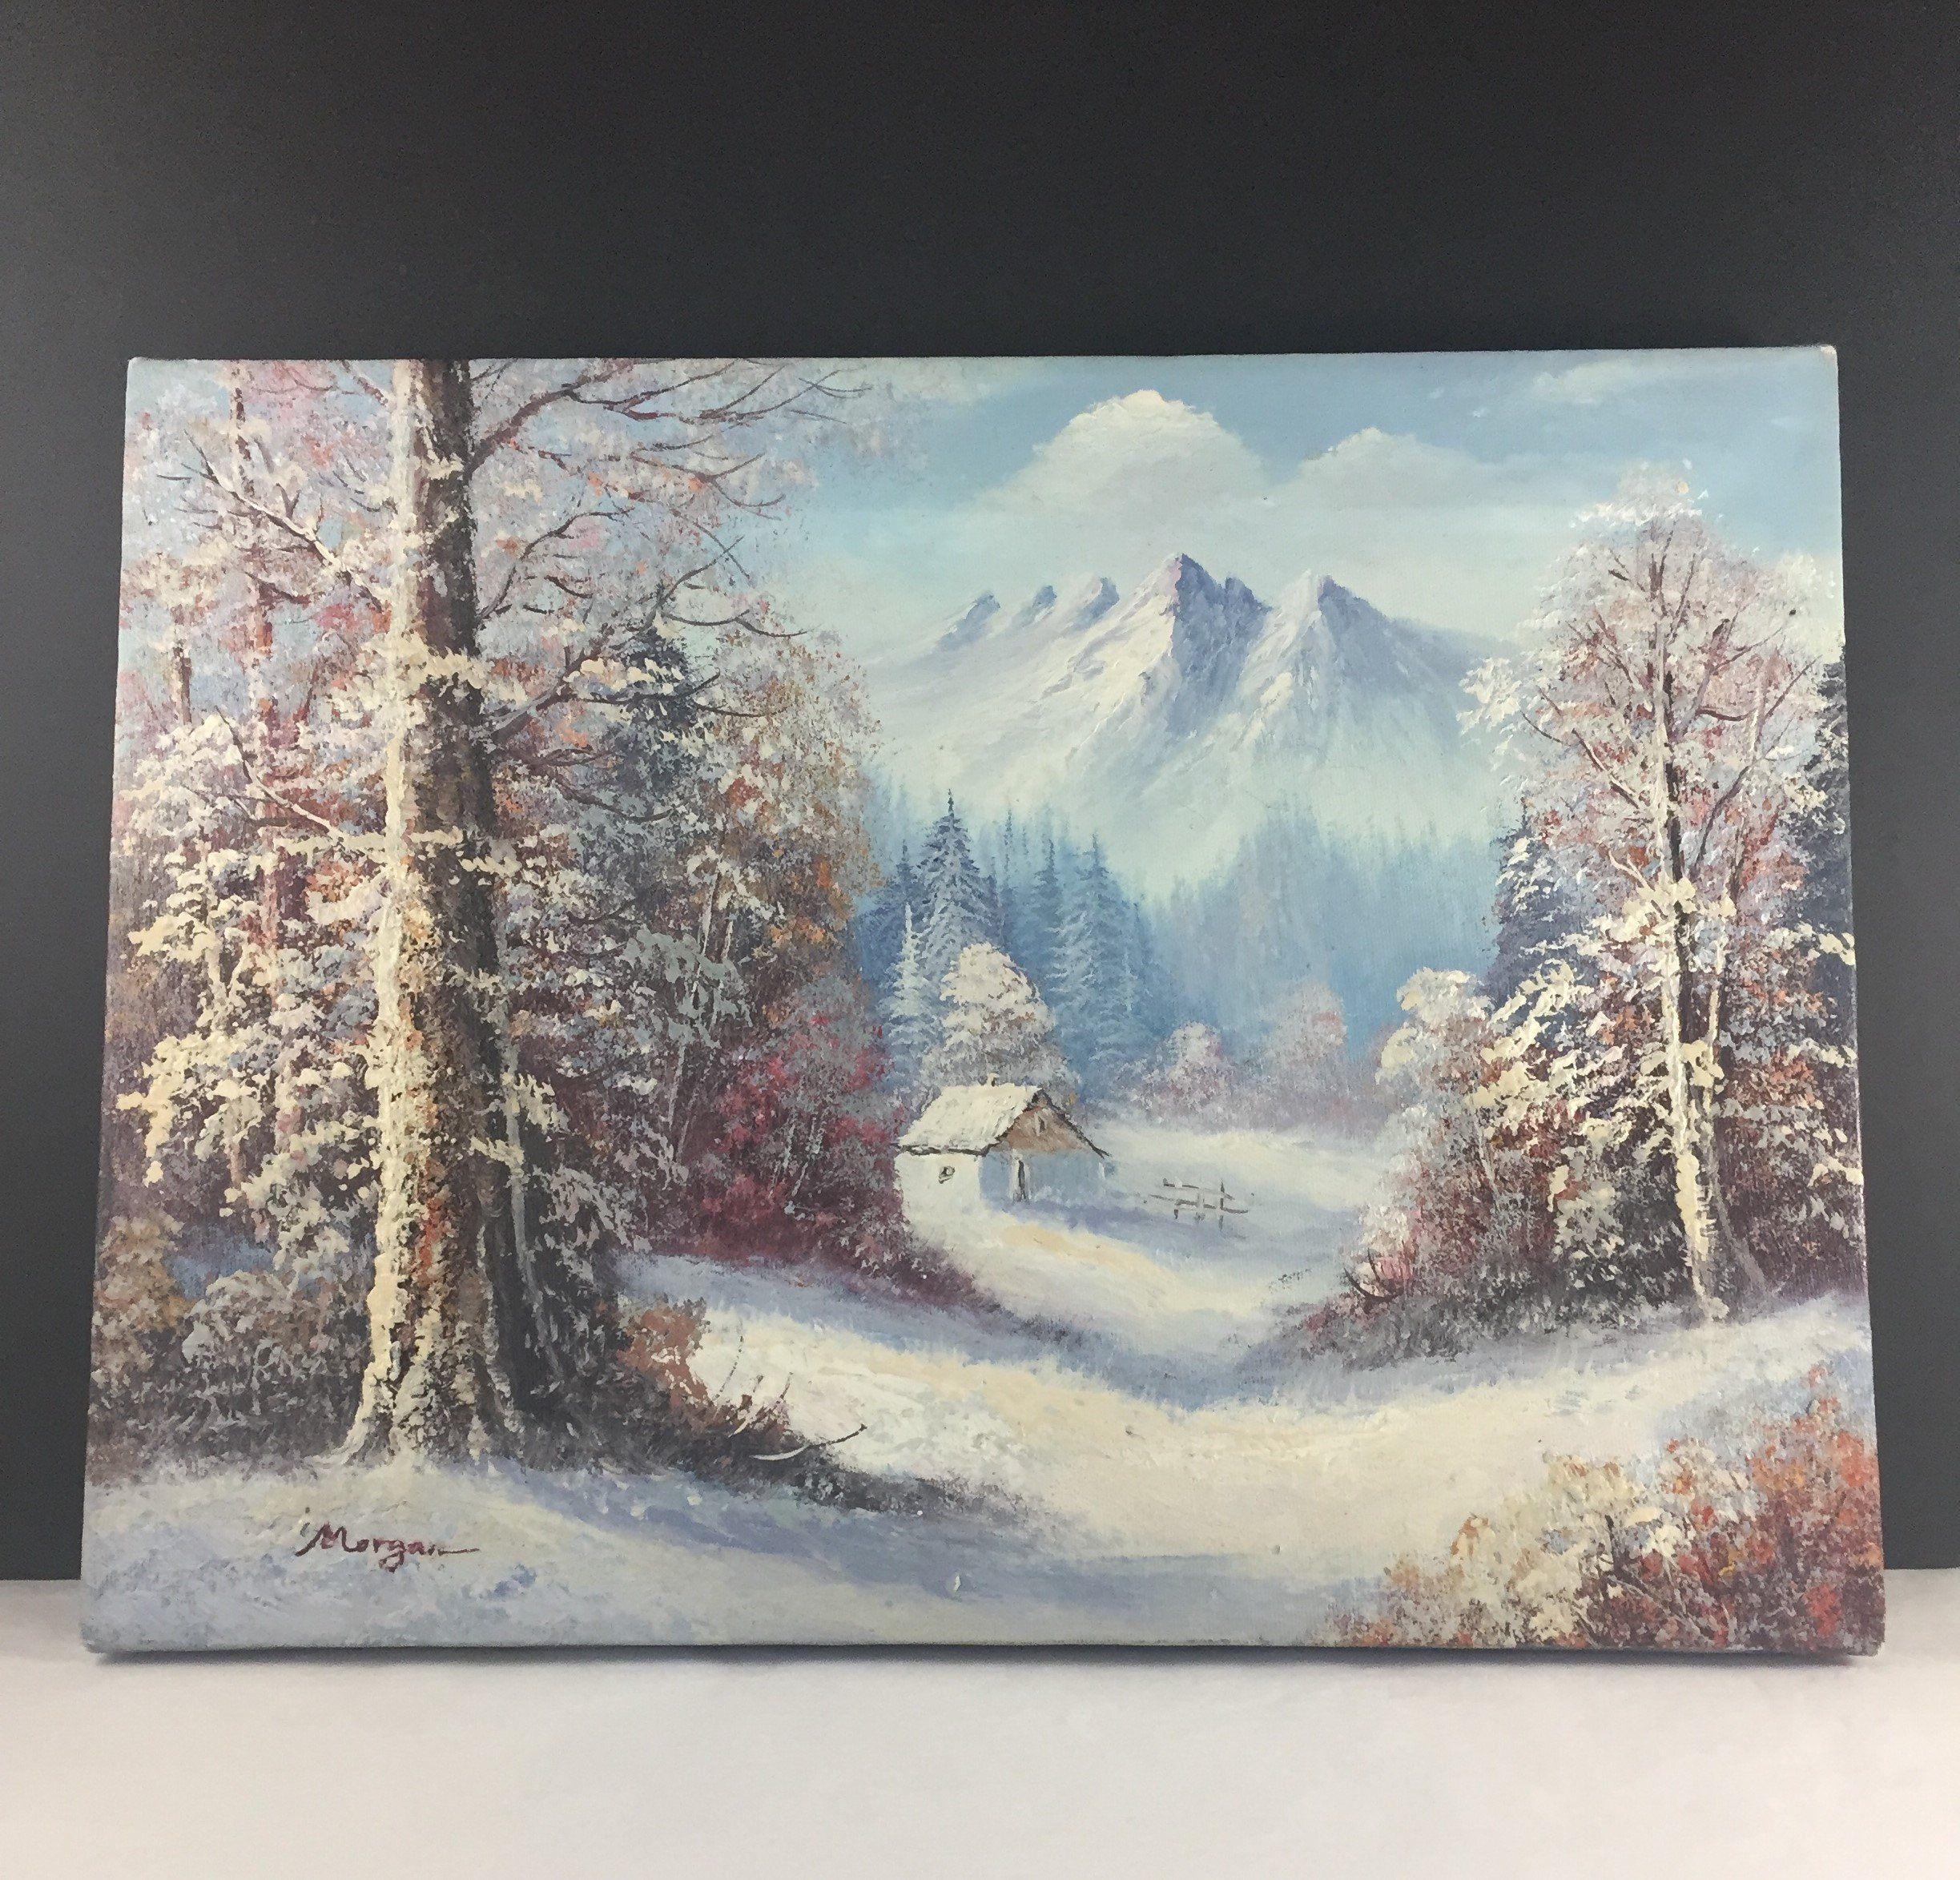 Original Oil Painting Vintage Winter Scene Oil Painting Mountain Scenery Oil Painting 12x16 Canvas Oil Winter Painting Mountain Paintings Bedroom Oil Painting